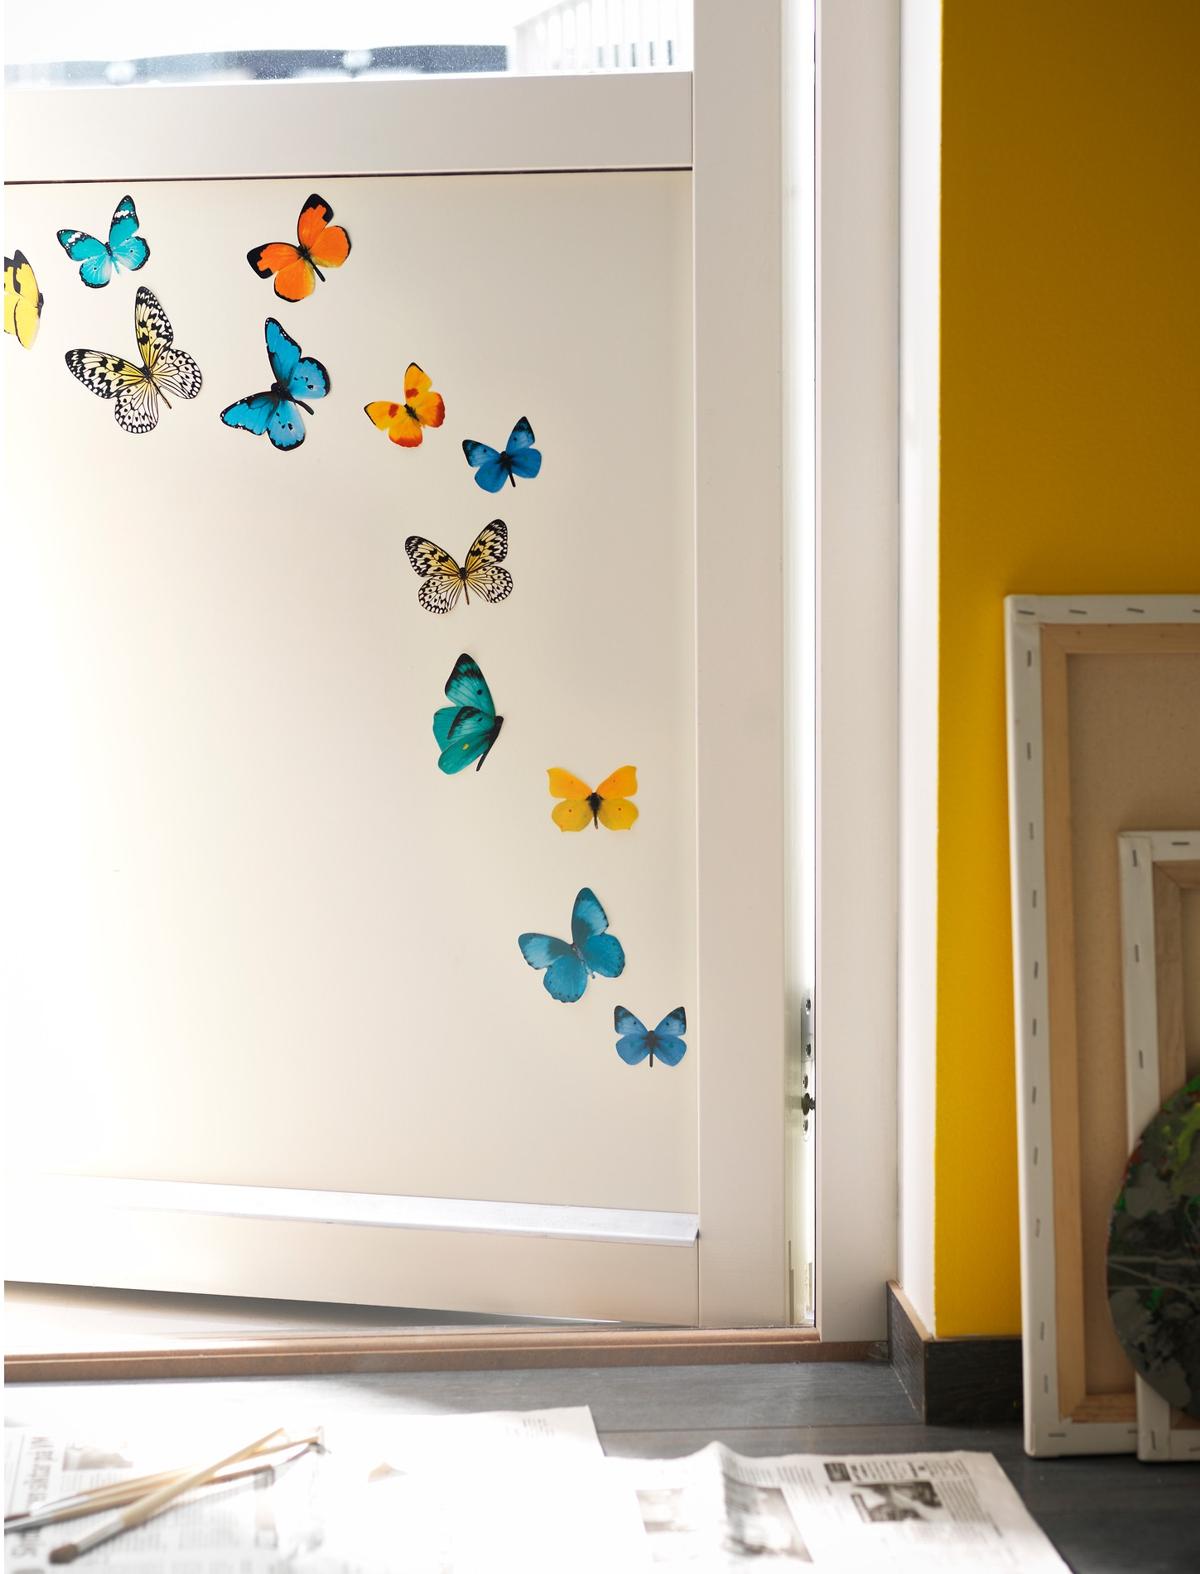 vinilos decorativos de Ikea - mod. Slätthult, mariposas